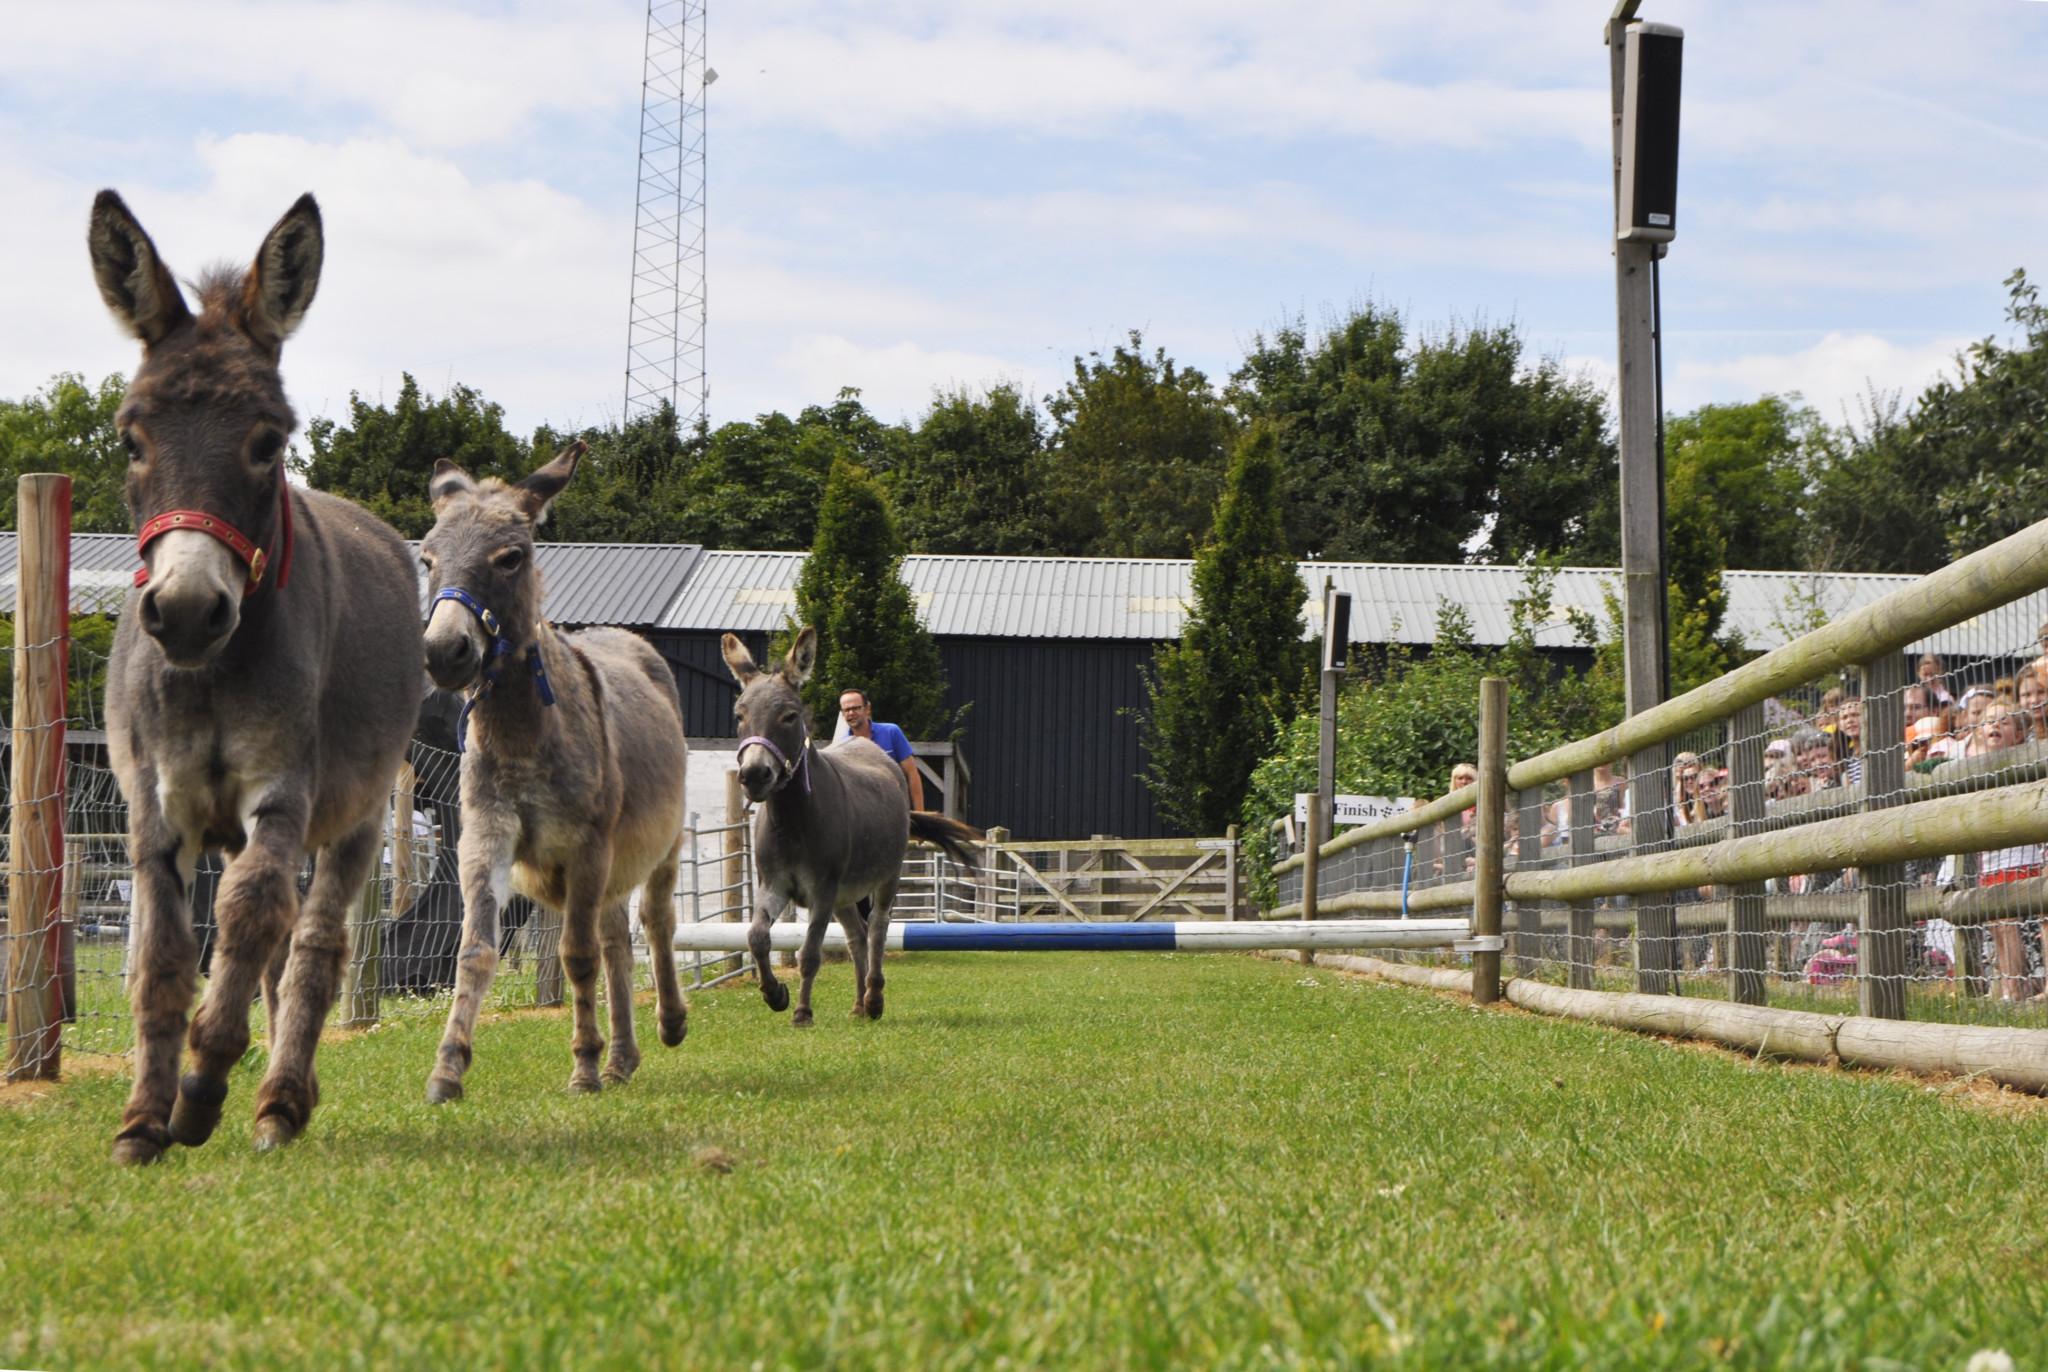 Donkey Derby Gallops Back To Barleylands This Summer